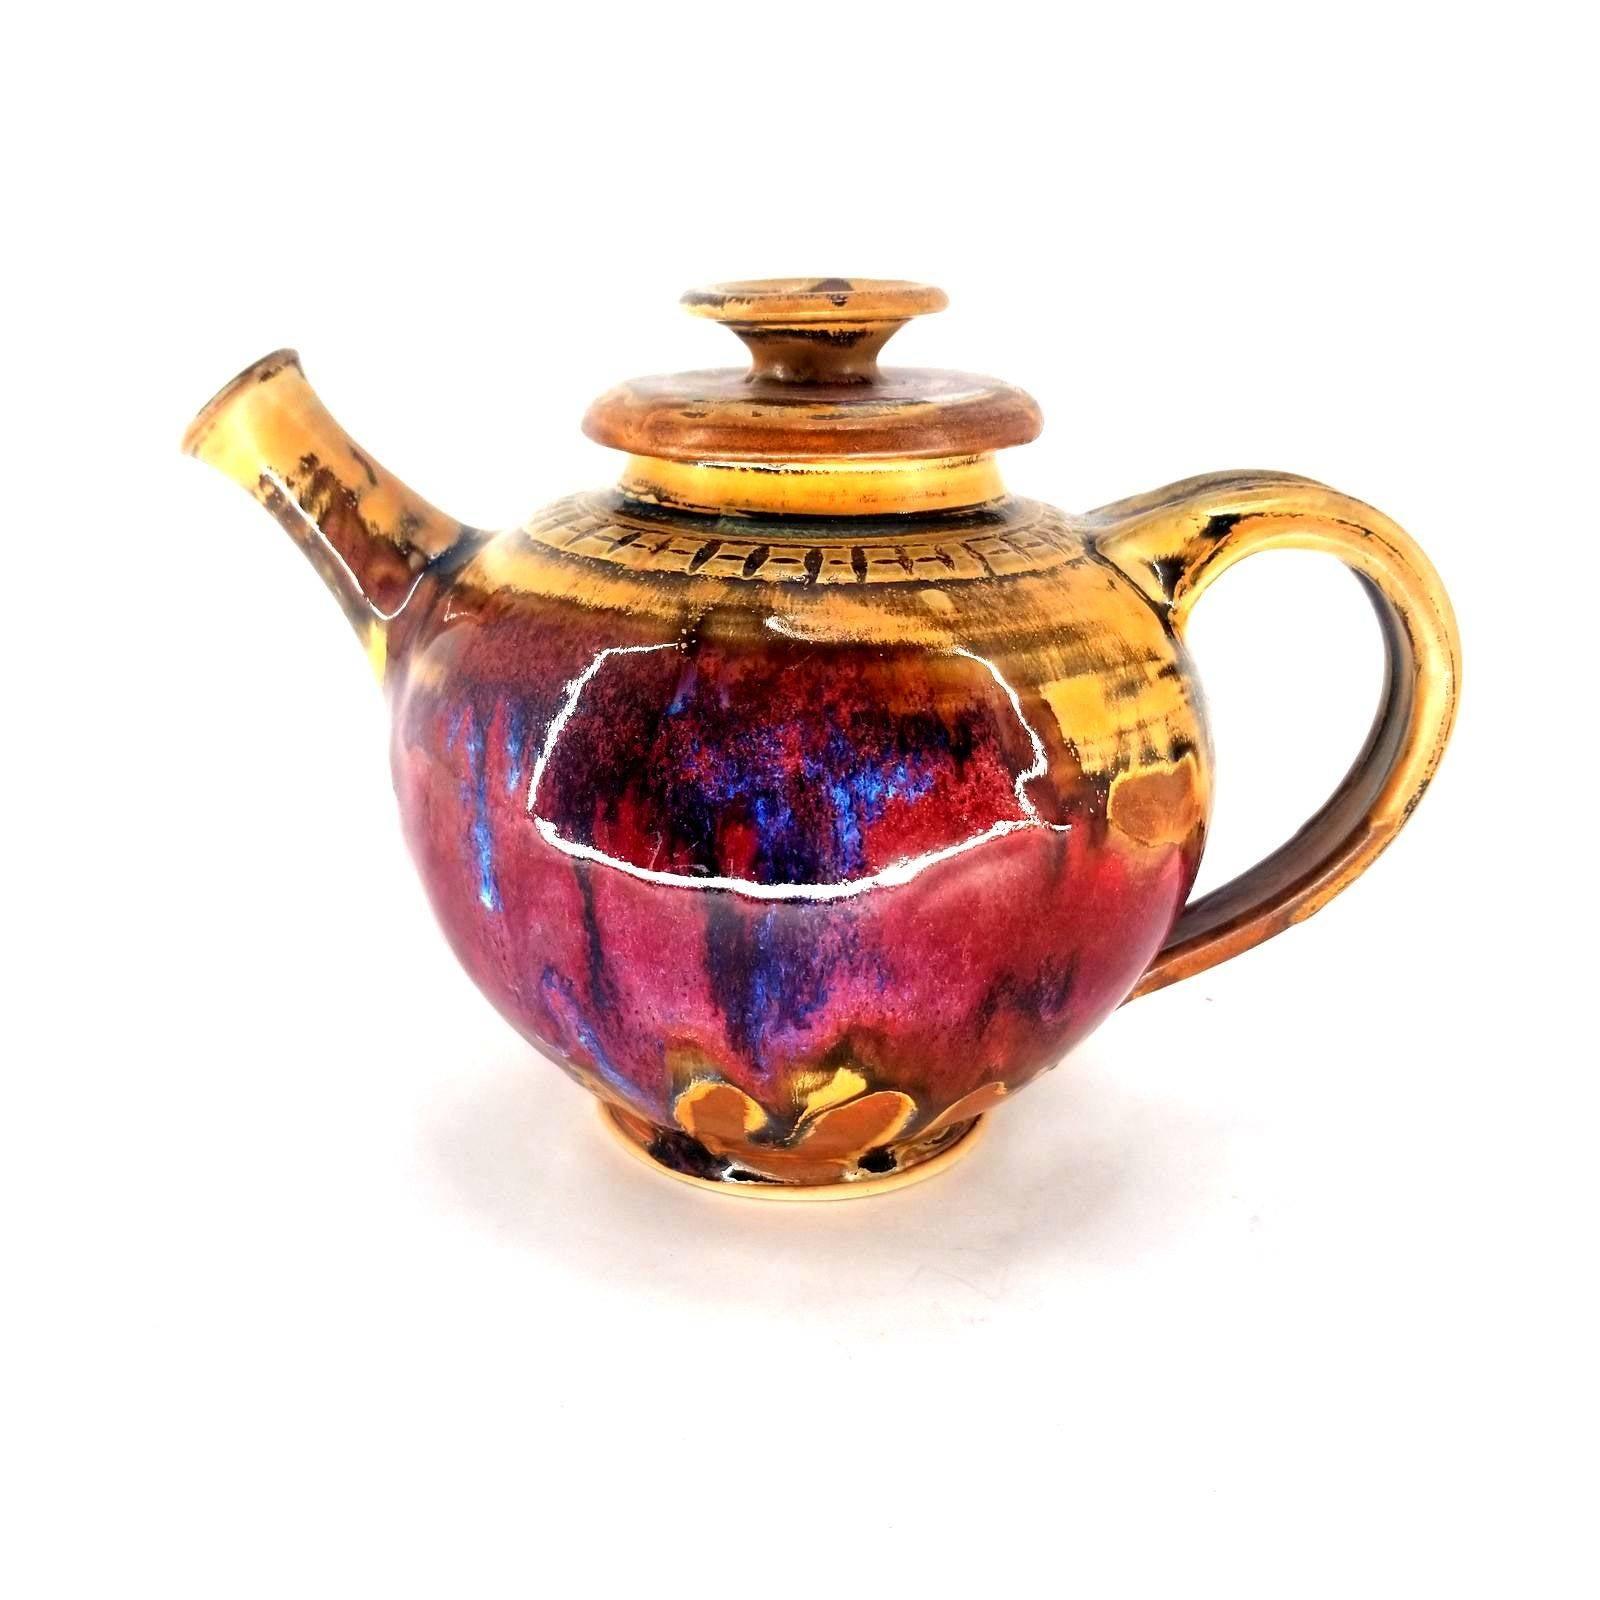 Handmade Raku Ceramic Pottery Teapot